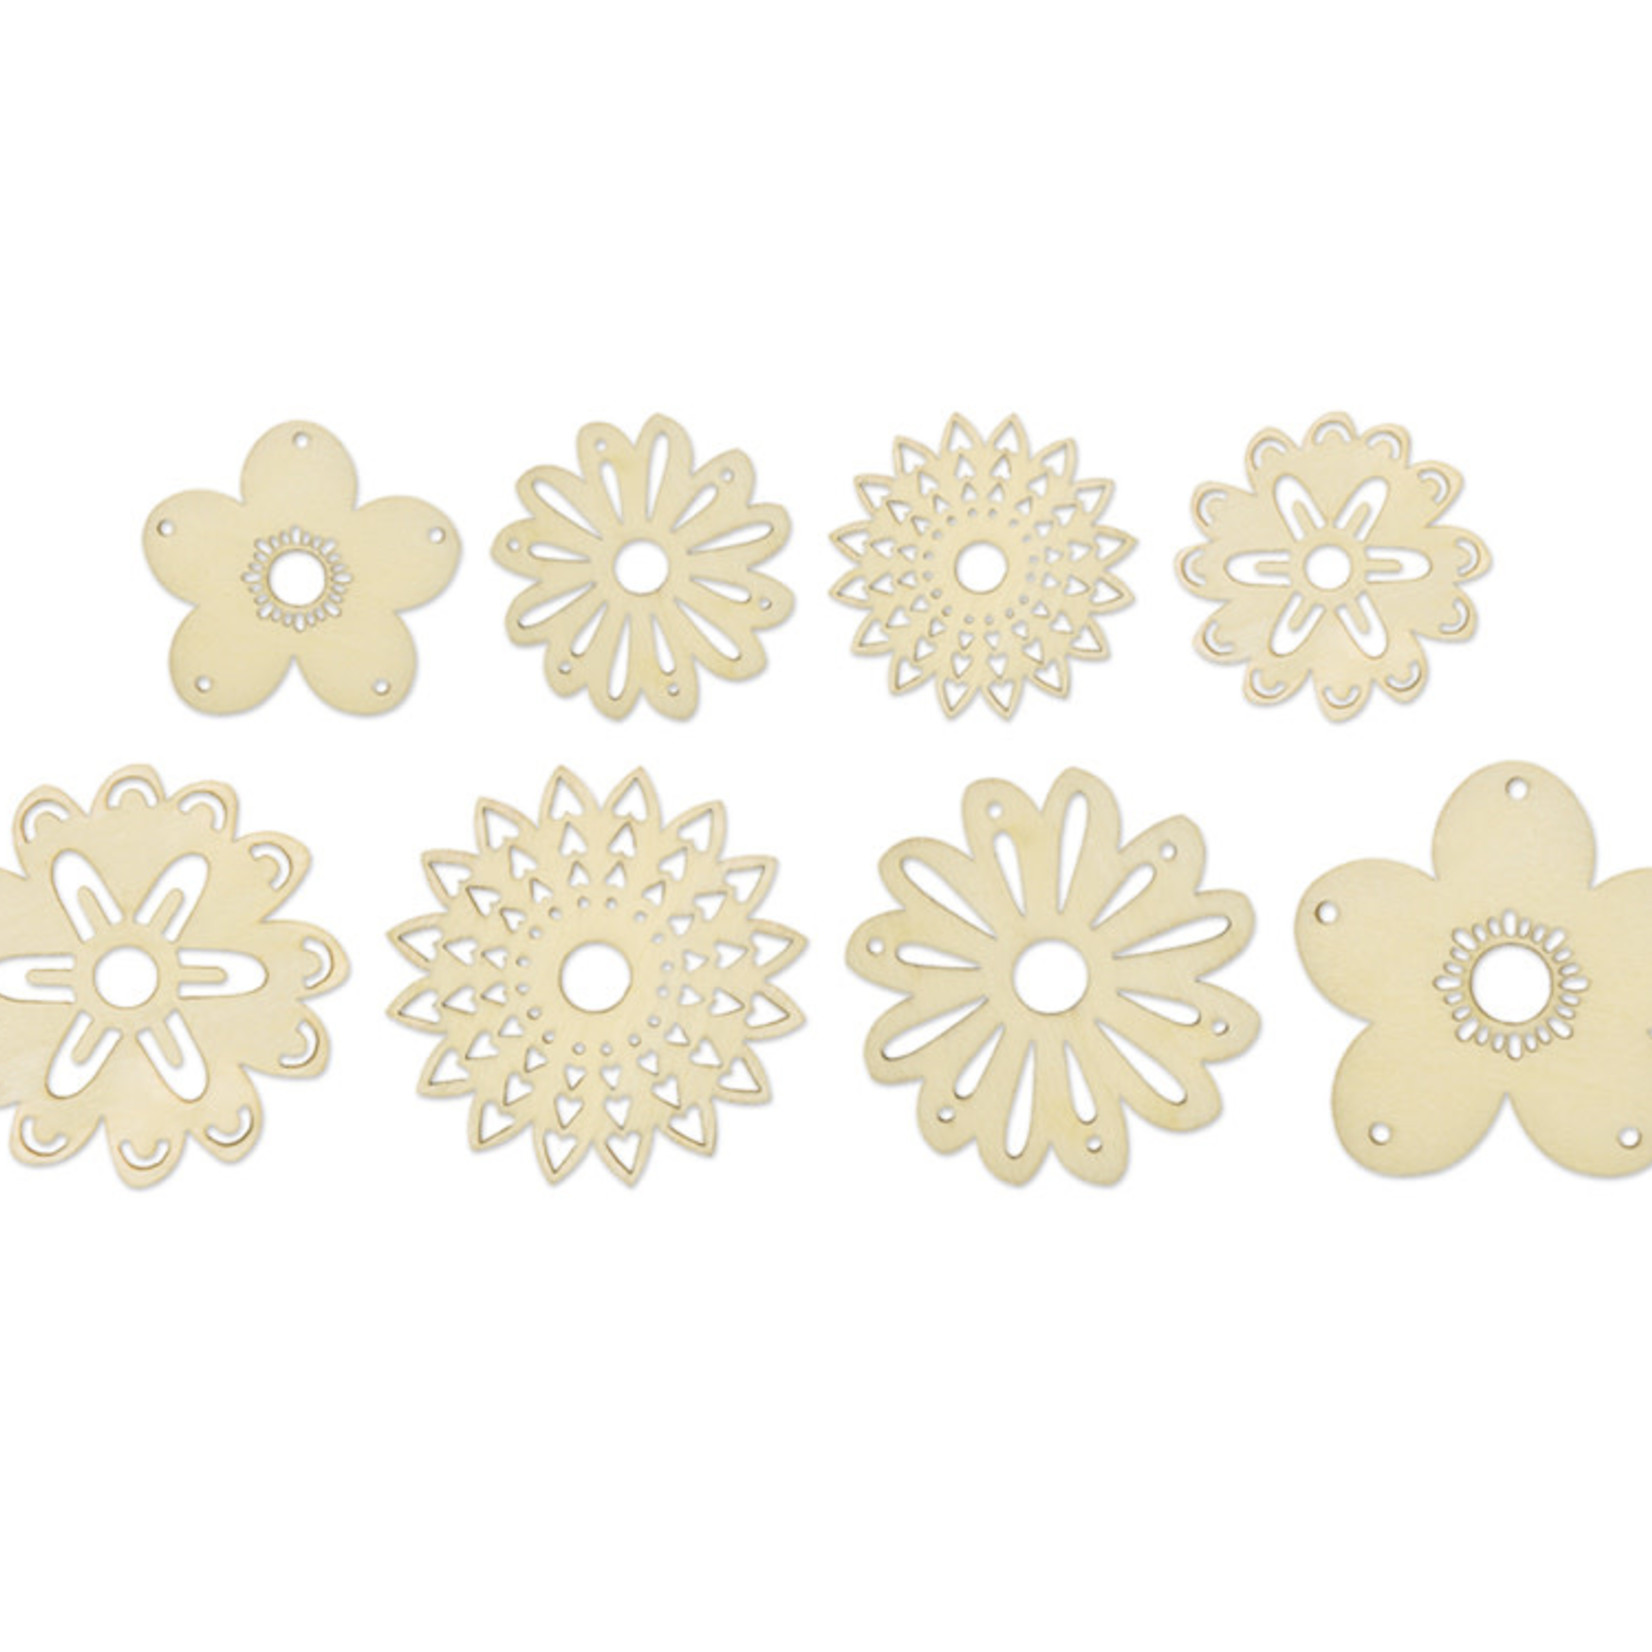 Laser-Cut Wood Shapes - Flowers